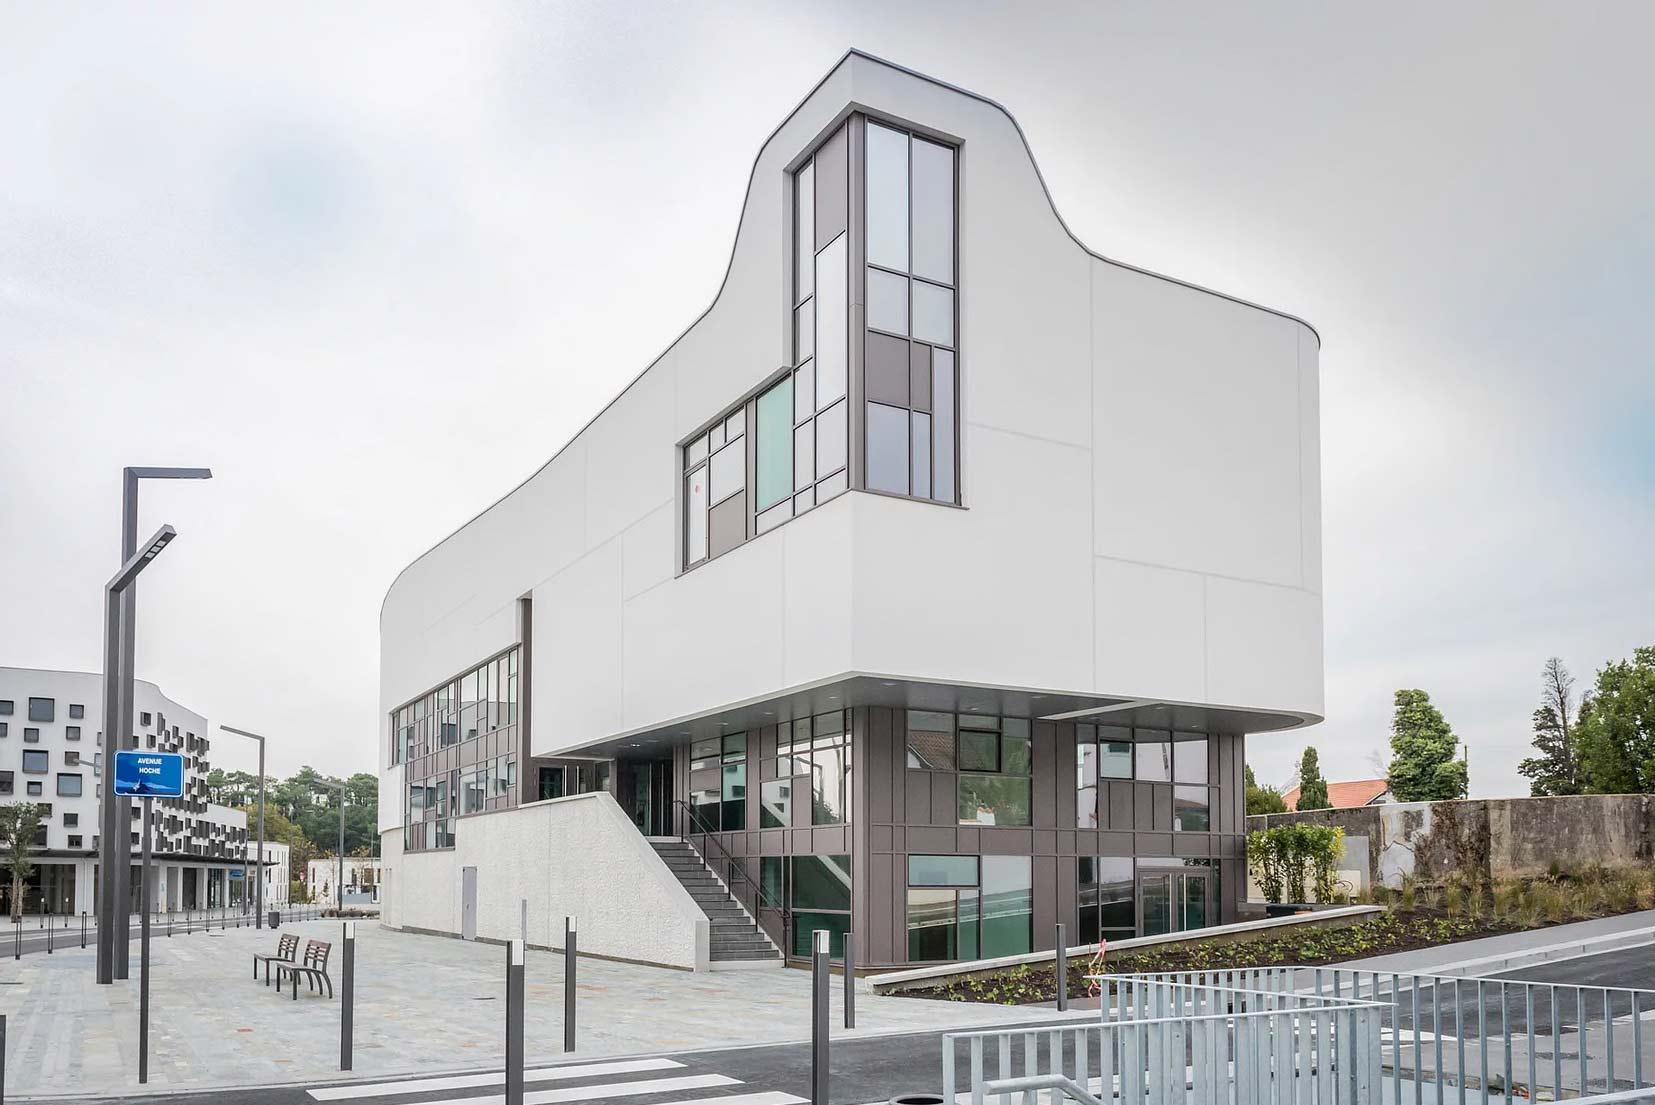 Ecole de Ballet - Studios Biarritz, quartier Kleber